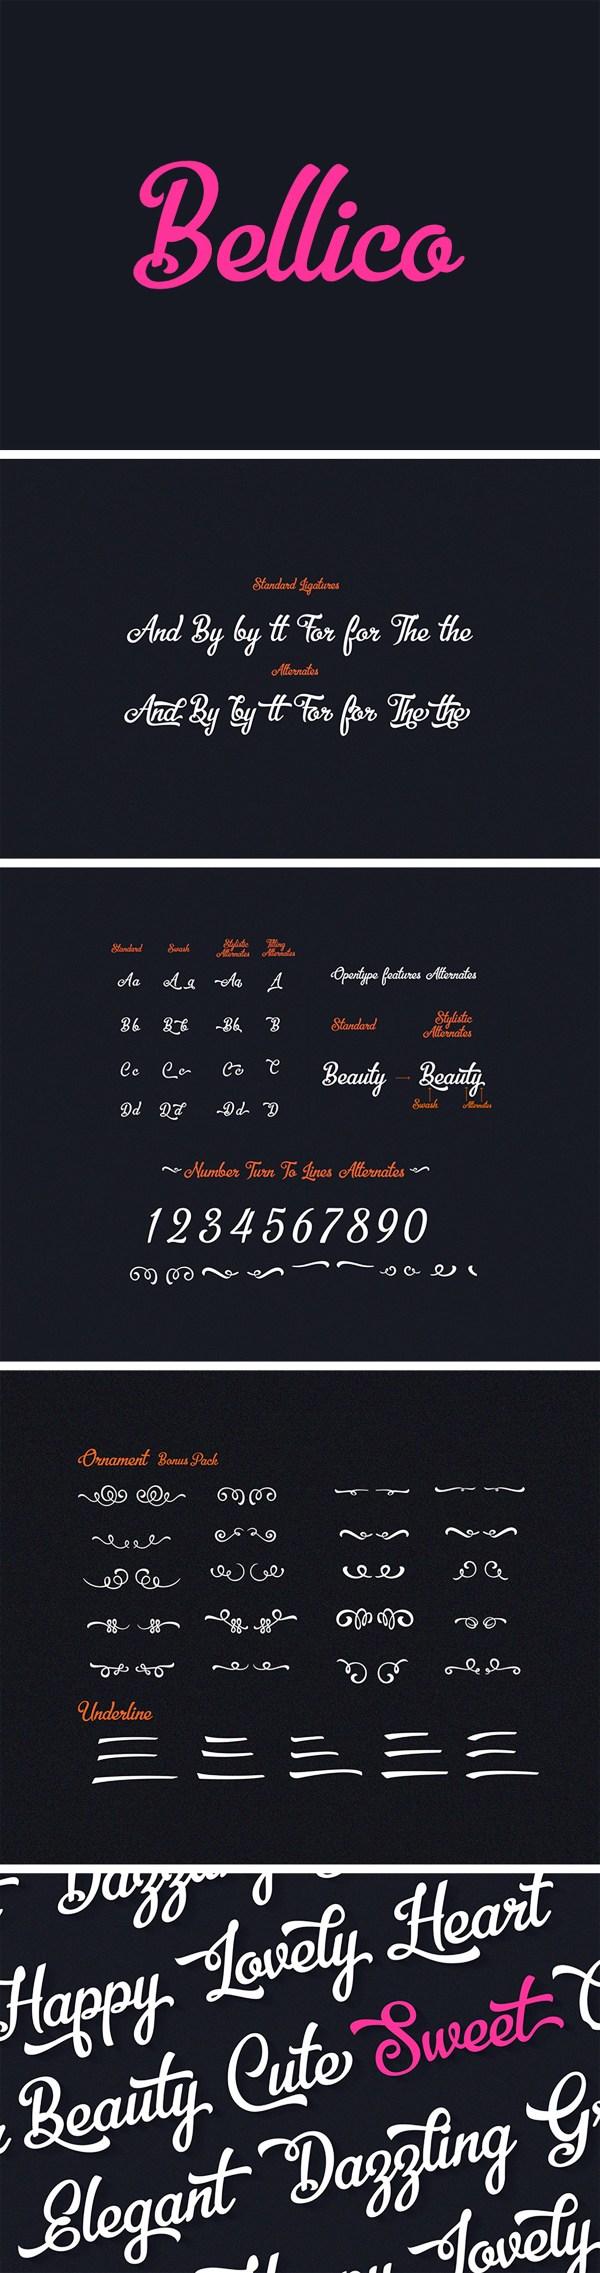 Free Font Bellico Typeface + Bonus Vectors